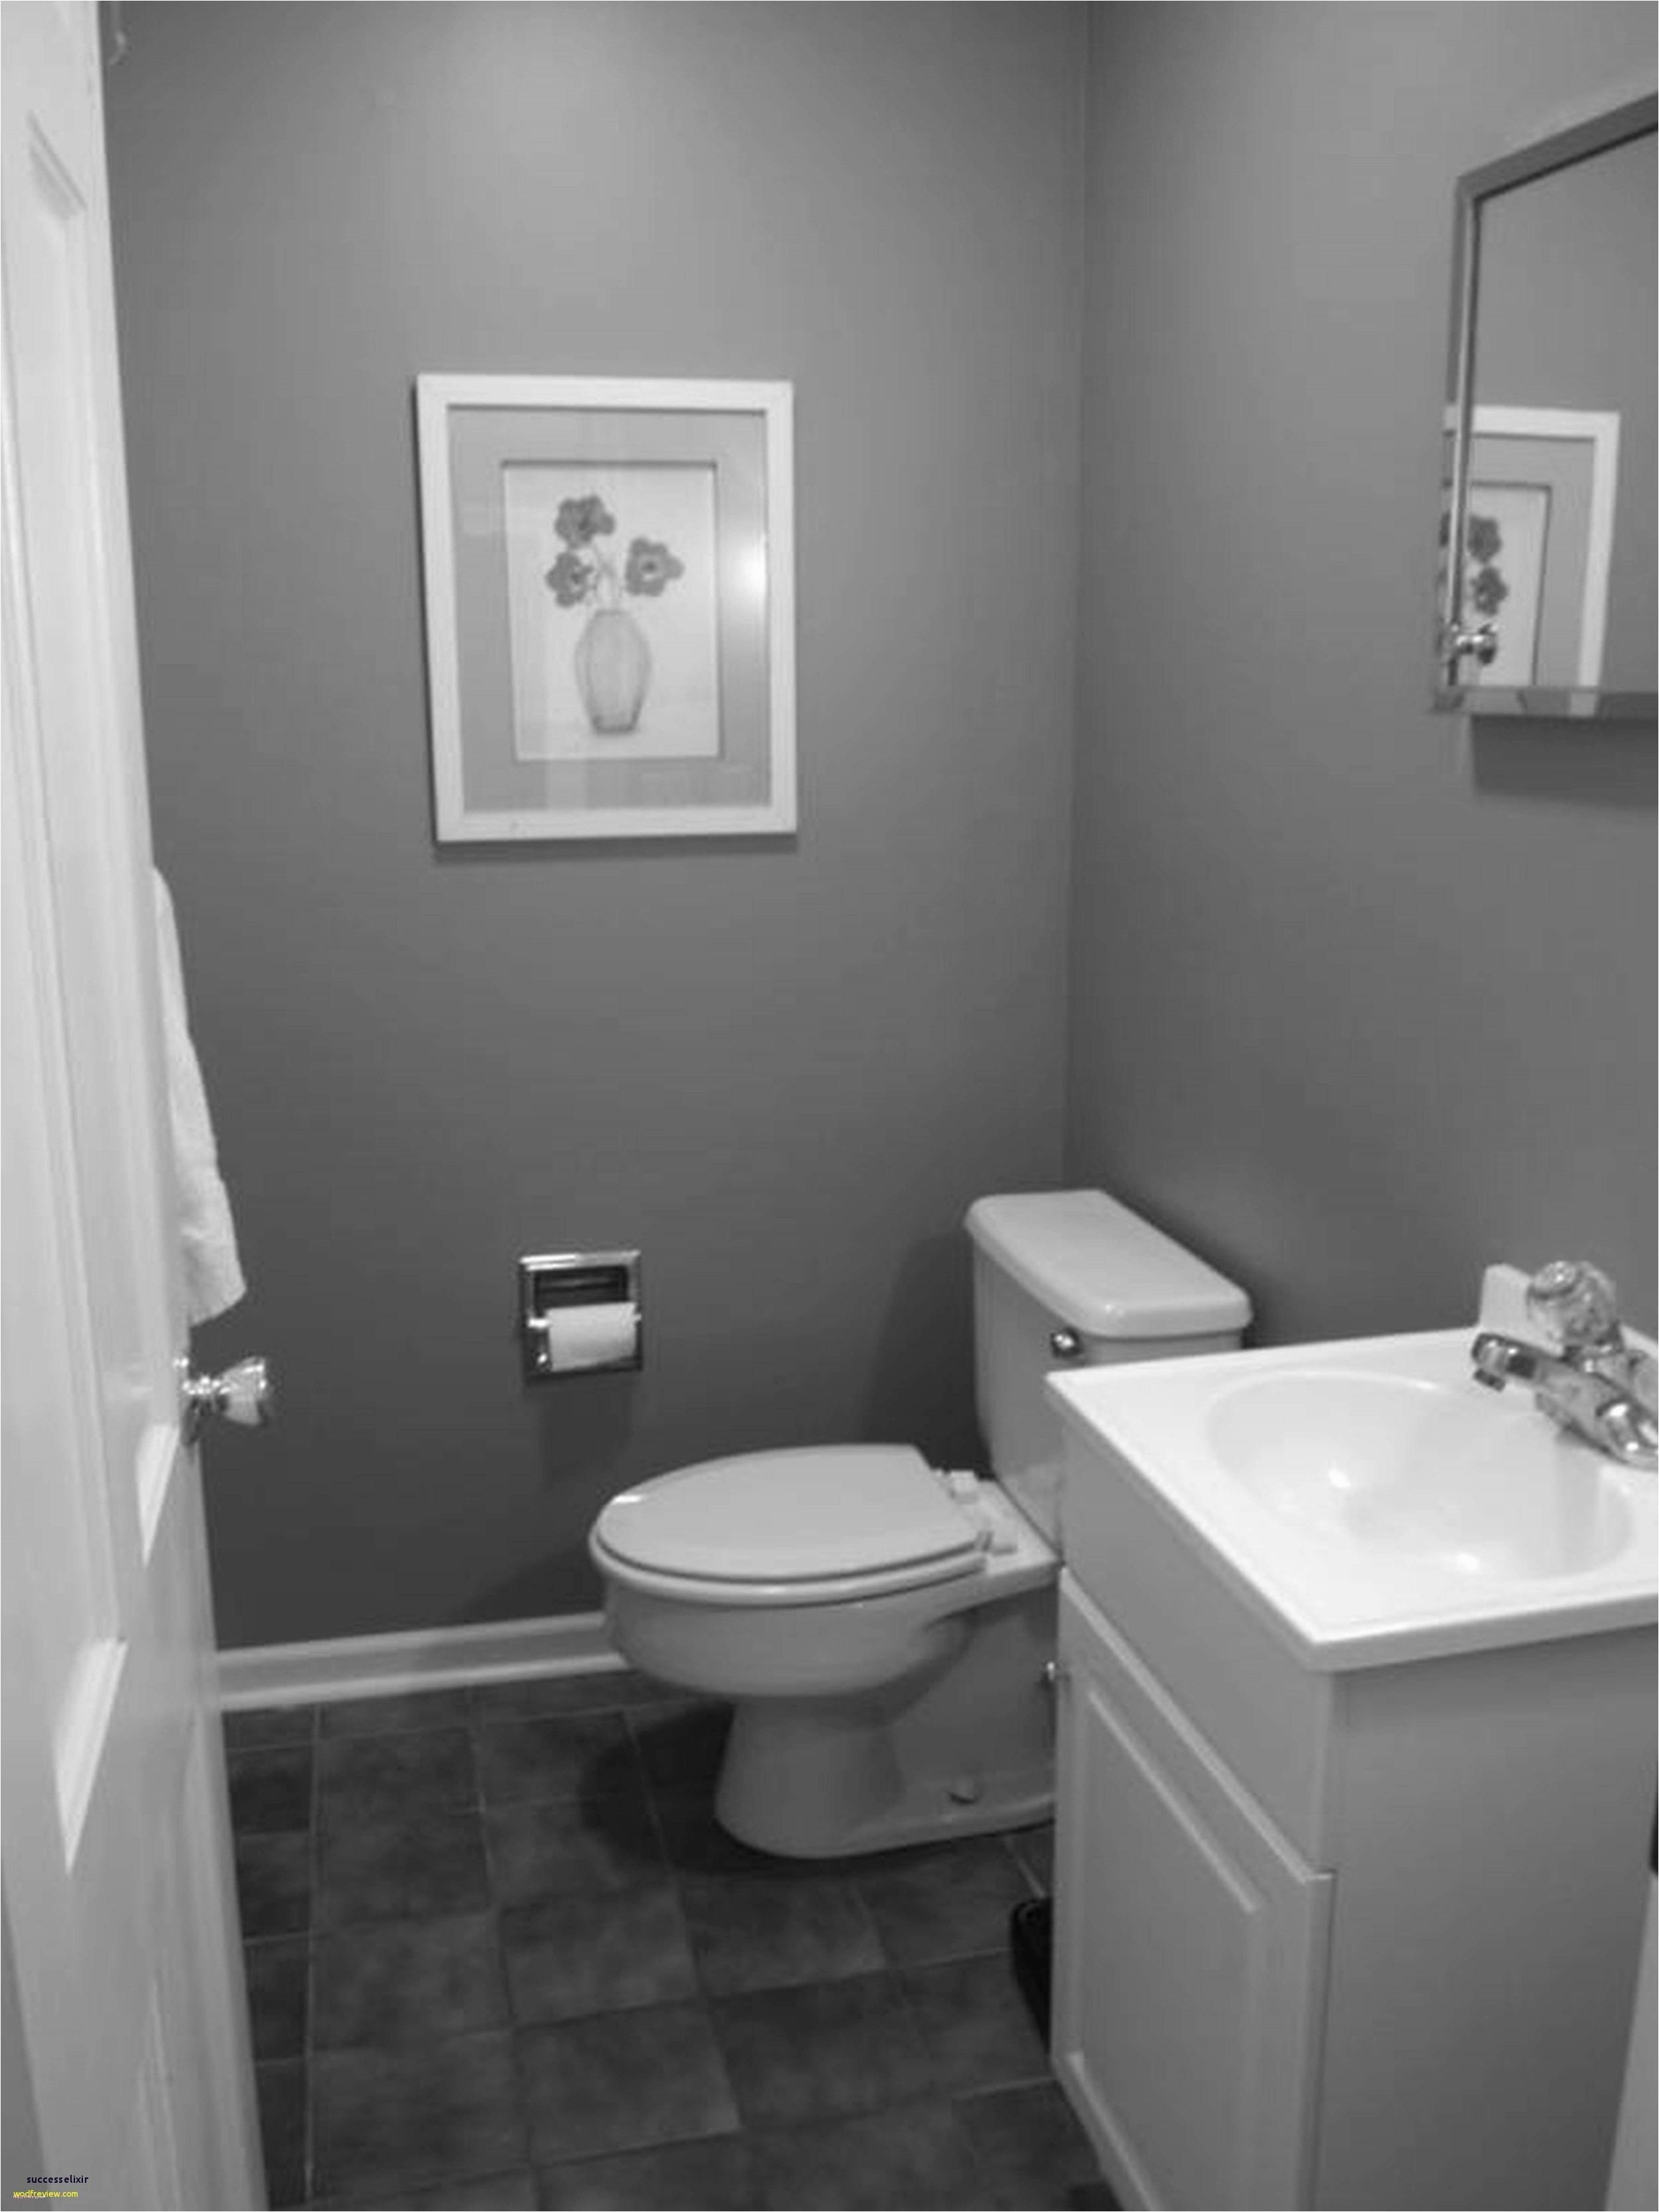 Bathroom Color and Design Ideas Inspirational top Bathroom Colors